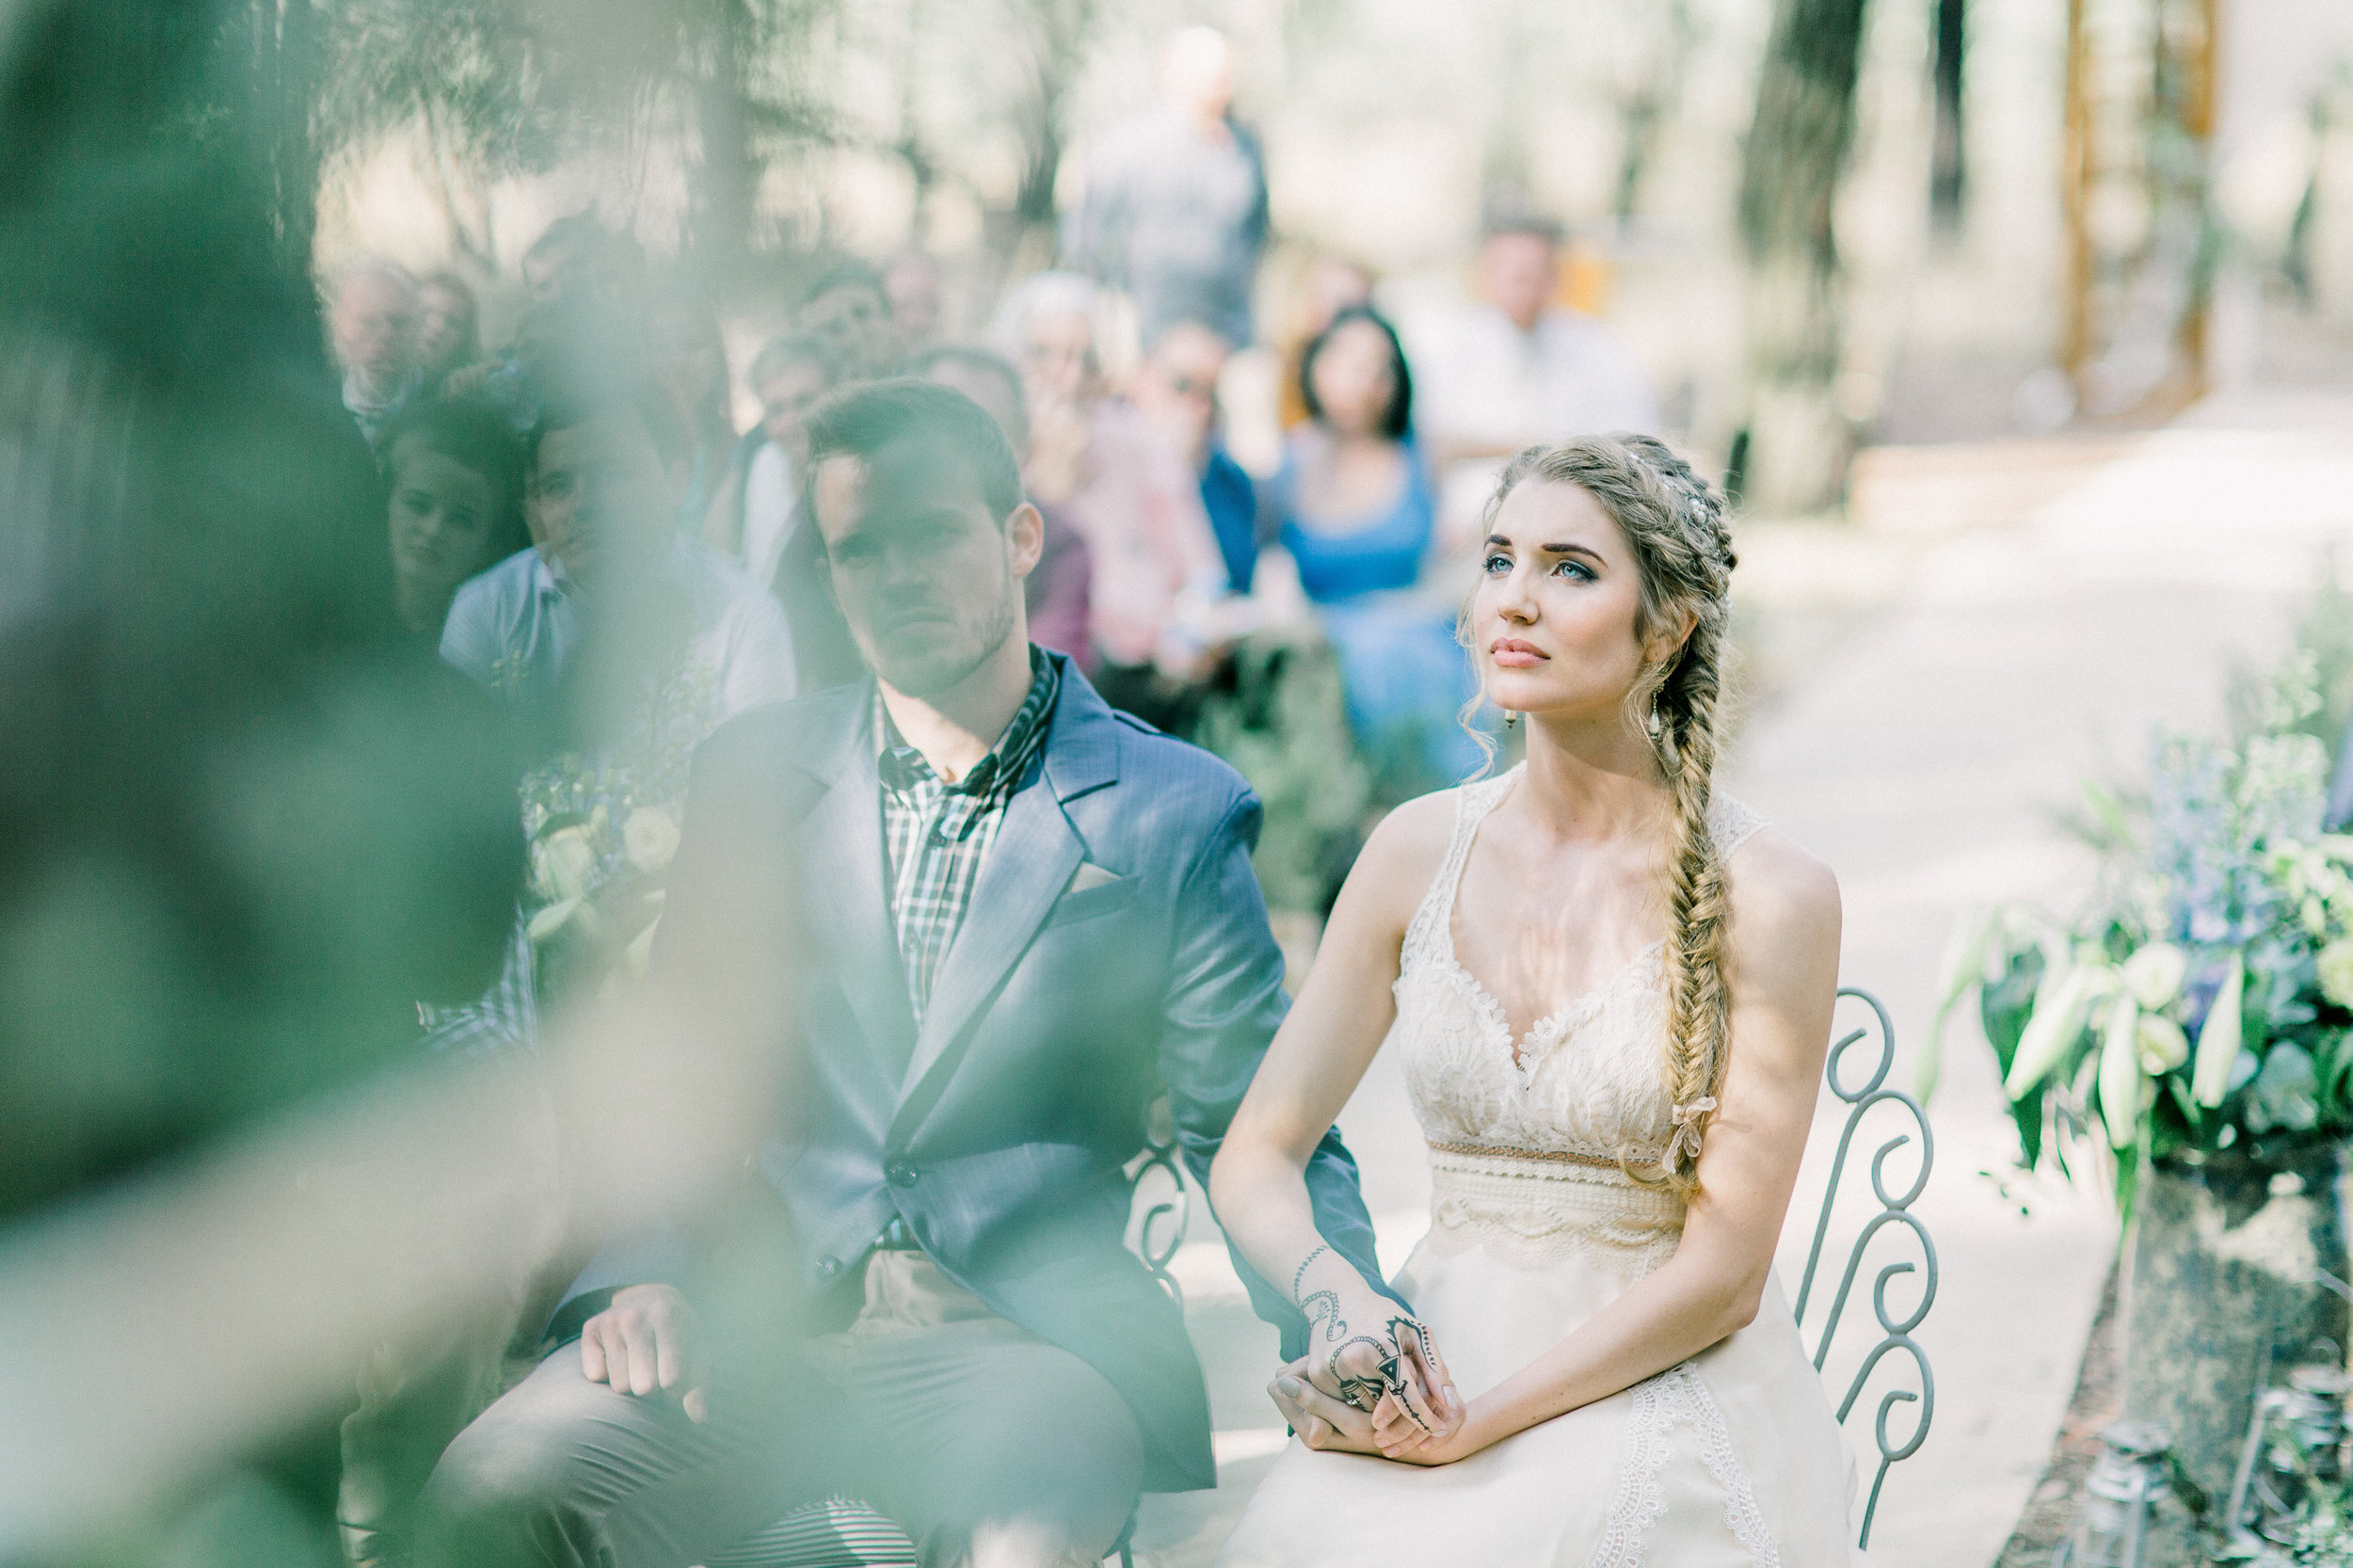 clareece smit south africa vintage boho wedding18.jpg